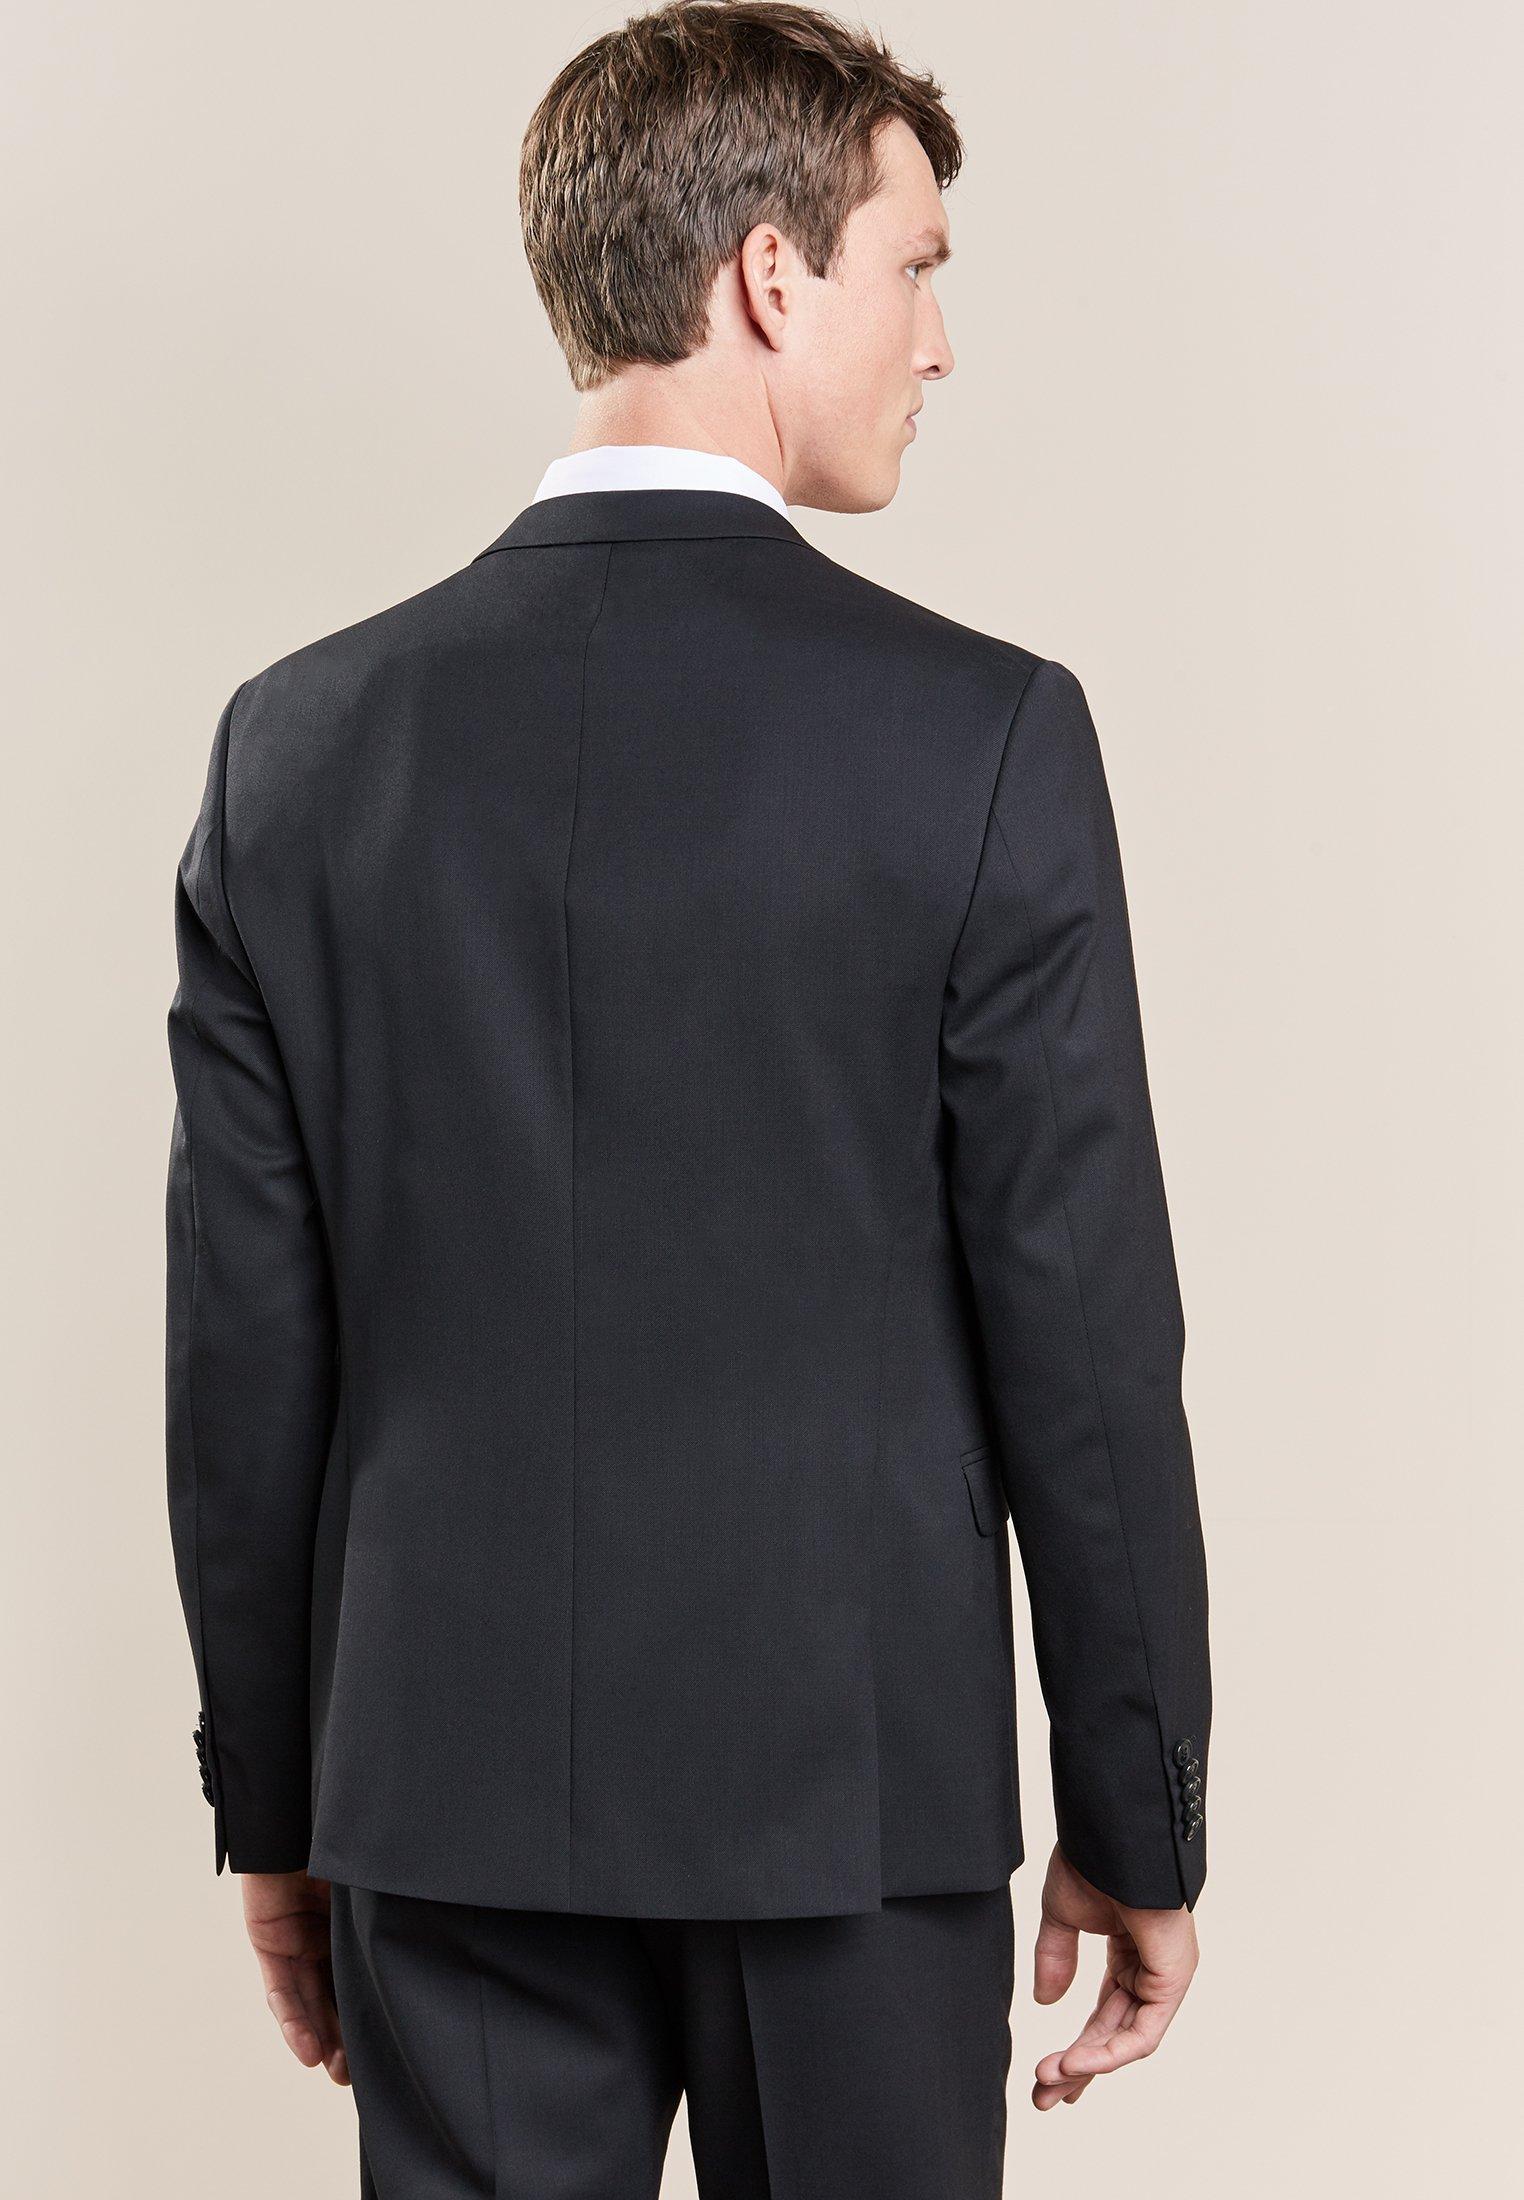 OregonVeste Black De Drykorn OregonVeste Costume OregonVeste Costume Drykorn Black De Drykorn H29eEIYWD